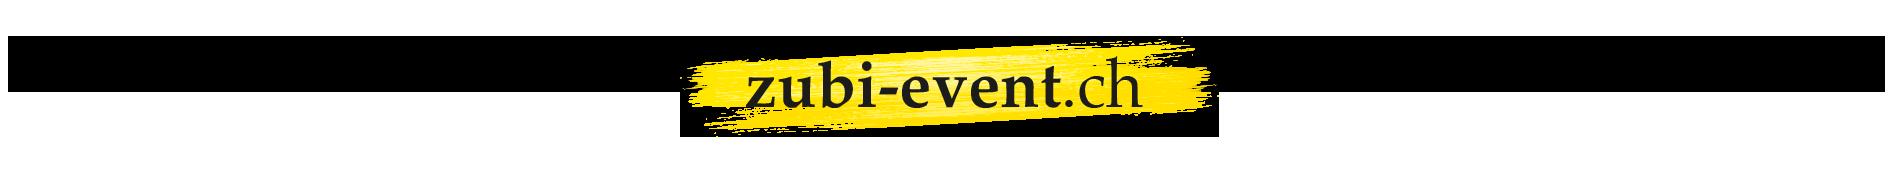 www.zubi-event.ch - Tombolalose & Eventartikel